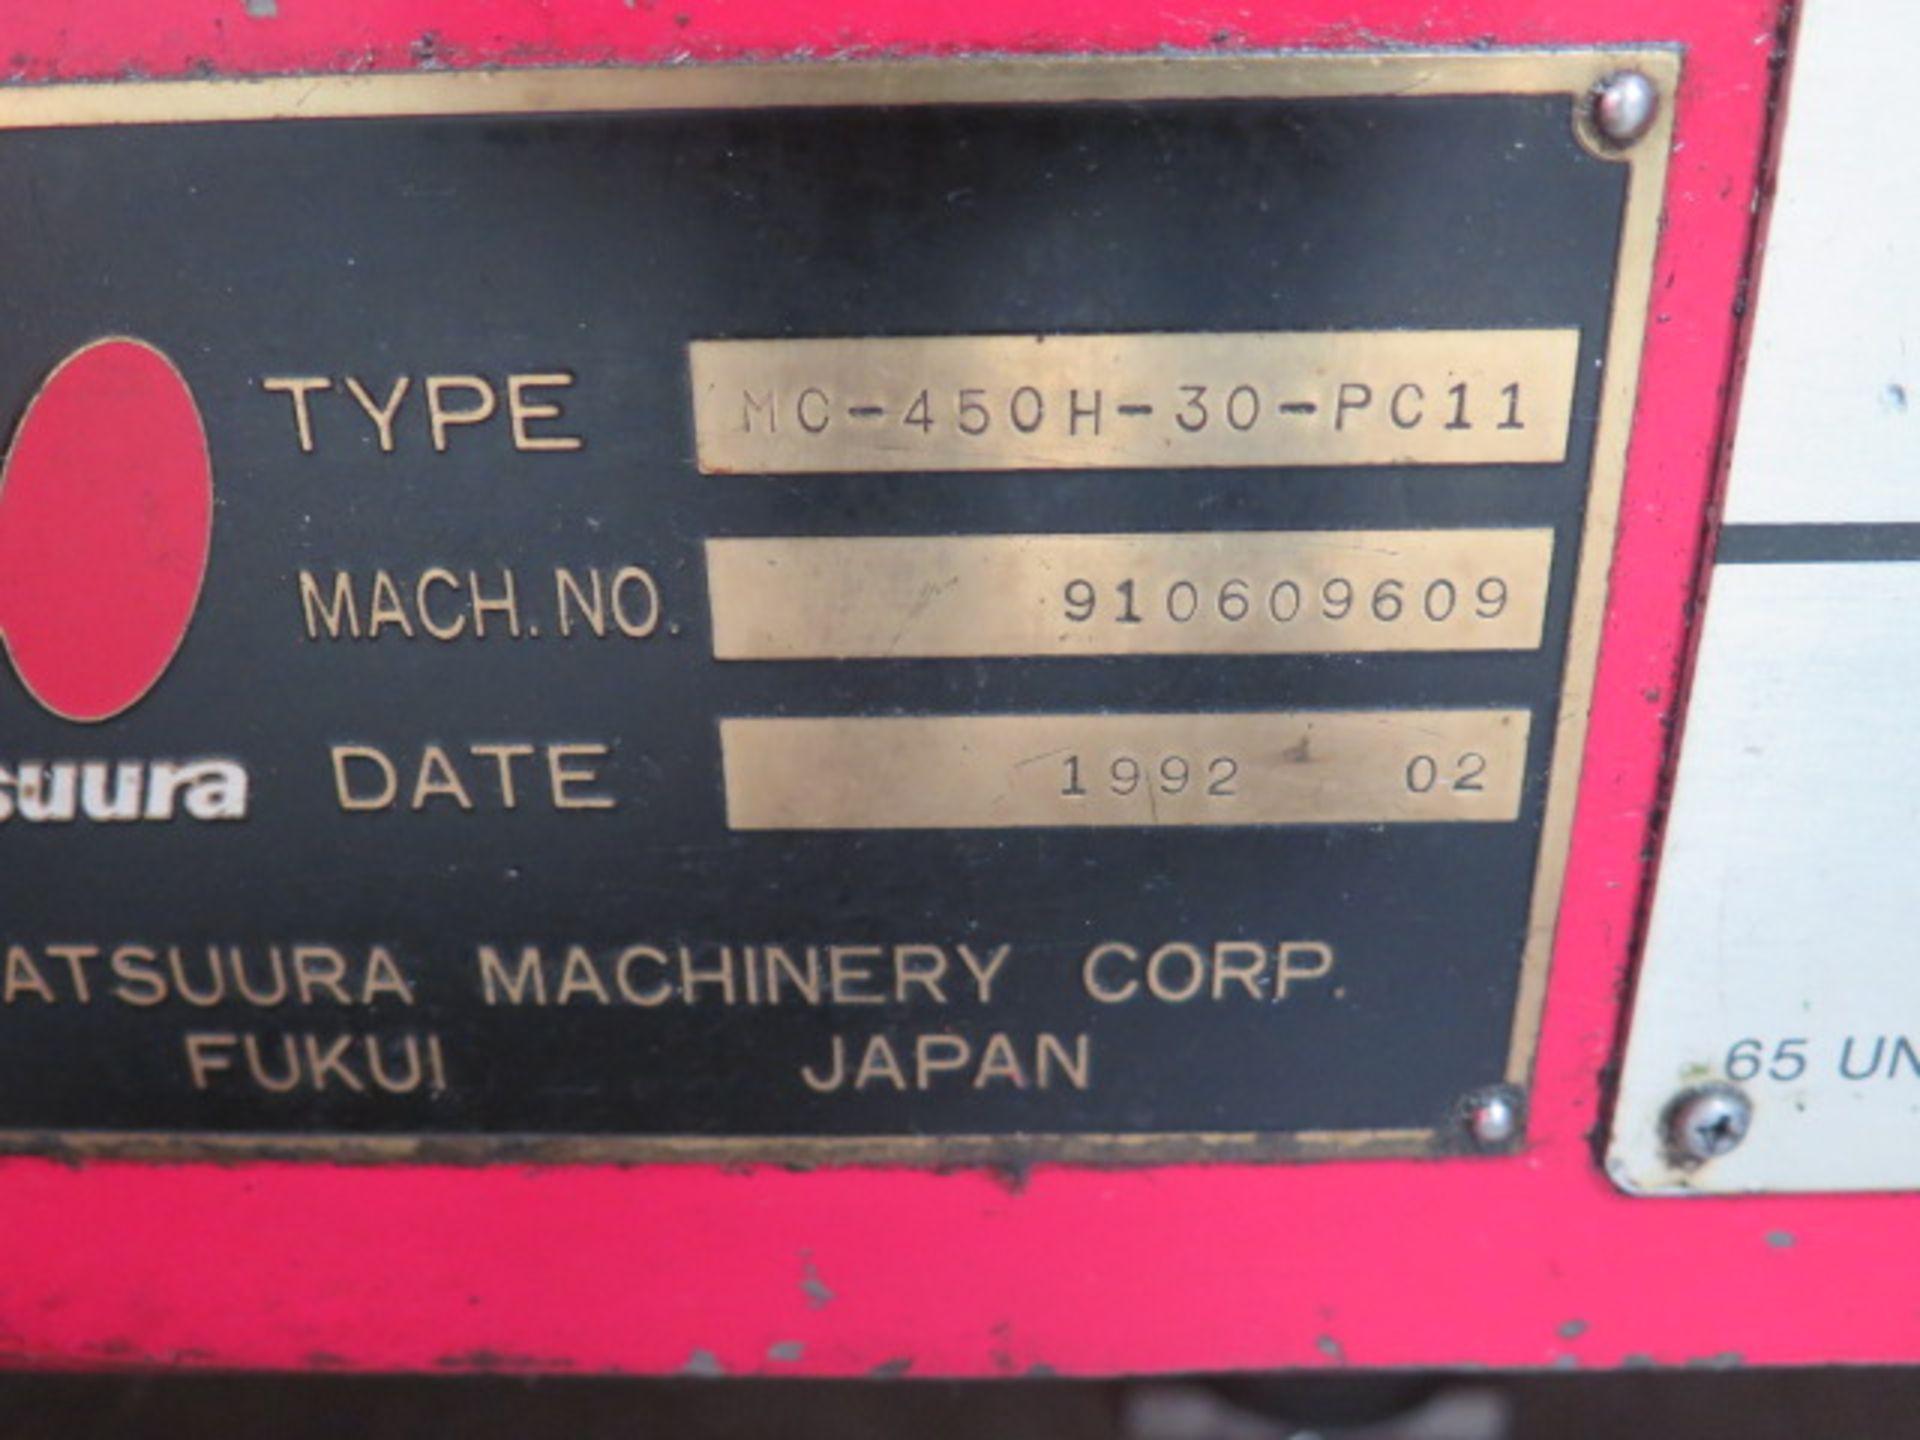 1992 Matsuura MC-450H-30-PC II 10-Pallet CNC Horizontal Machining Center s/n 910609609, SOLD AS IS - Image 23 of 23